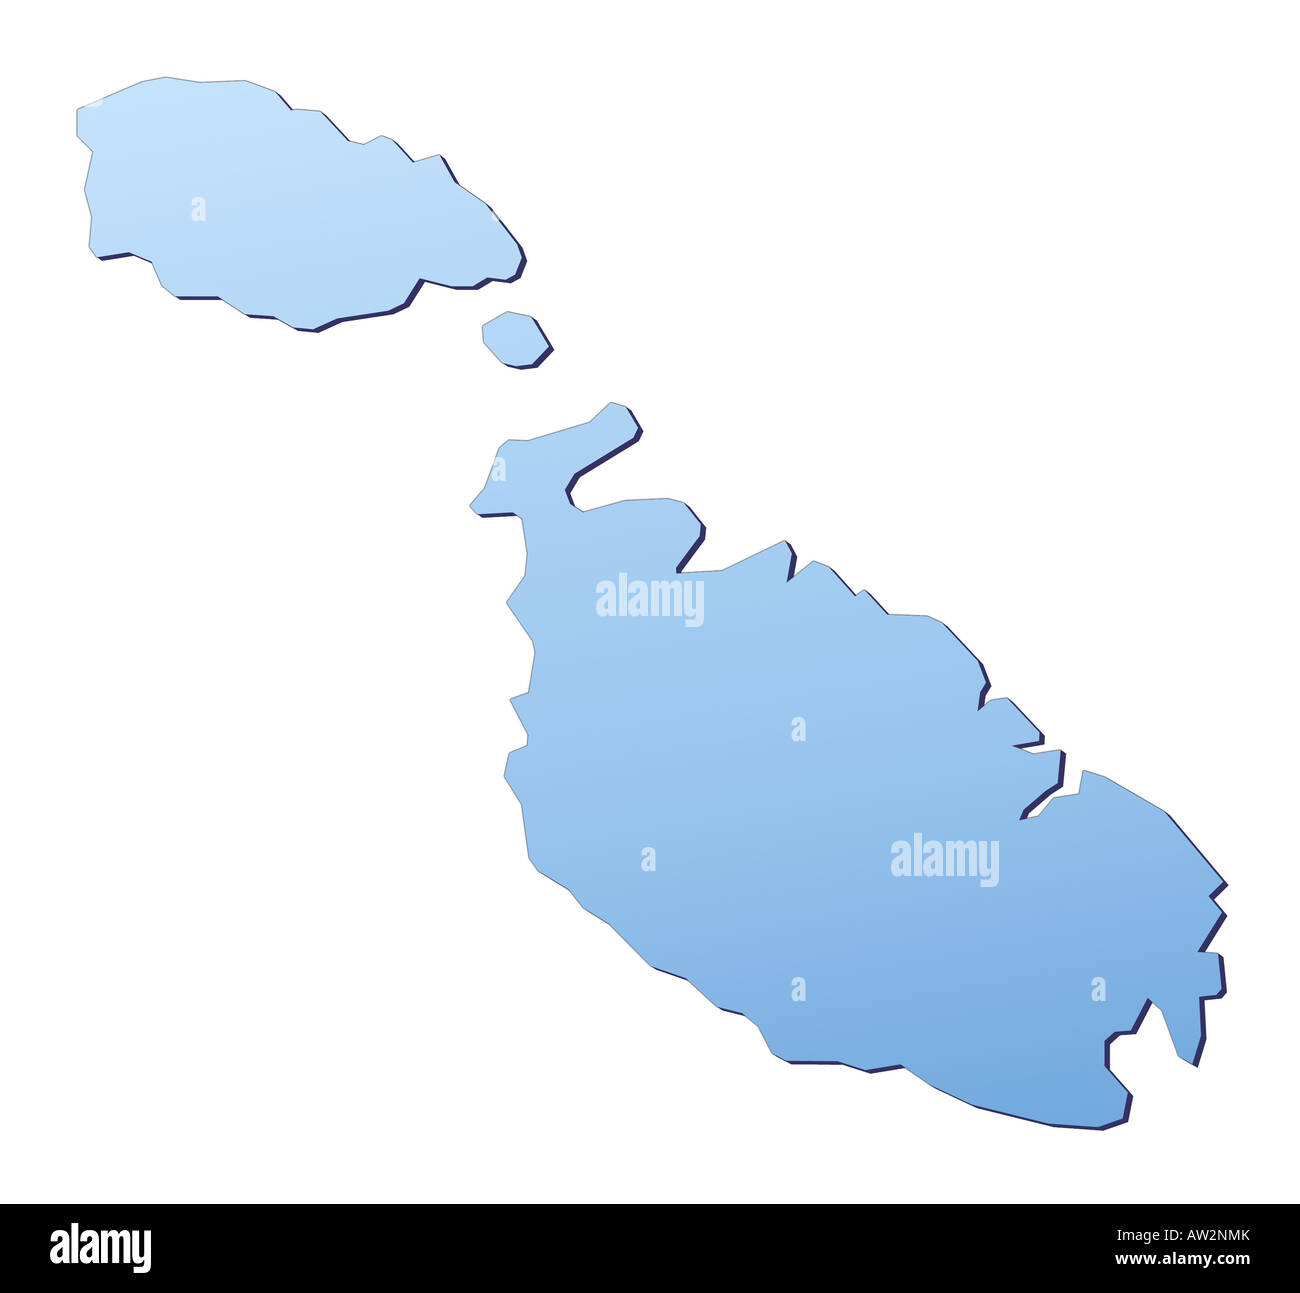 Malta map Stock Photo: 16446210 - Alamy